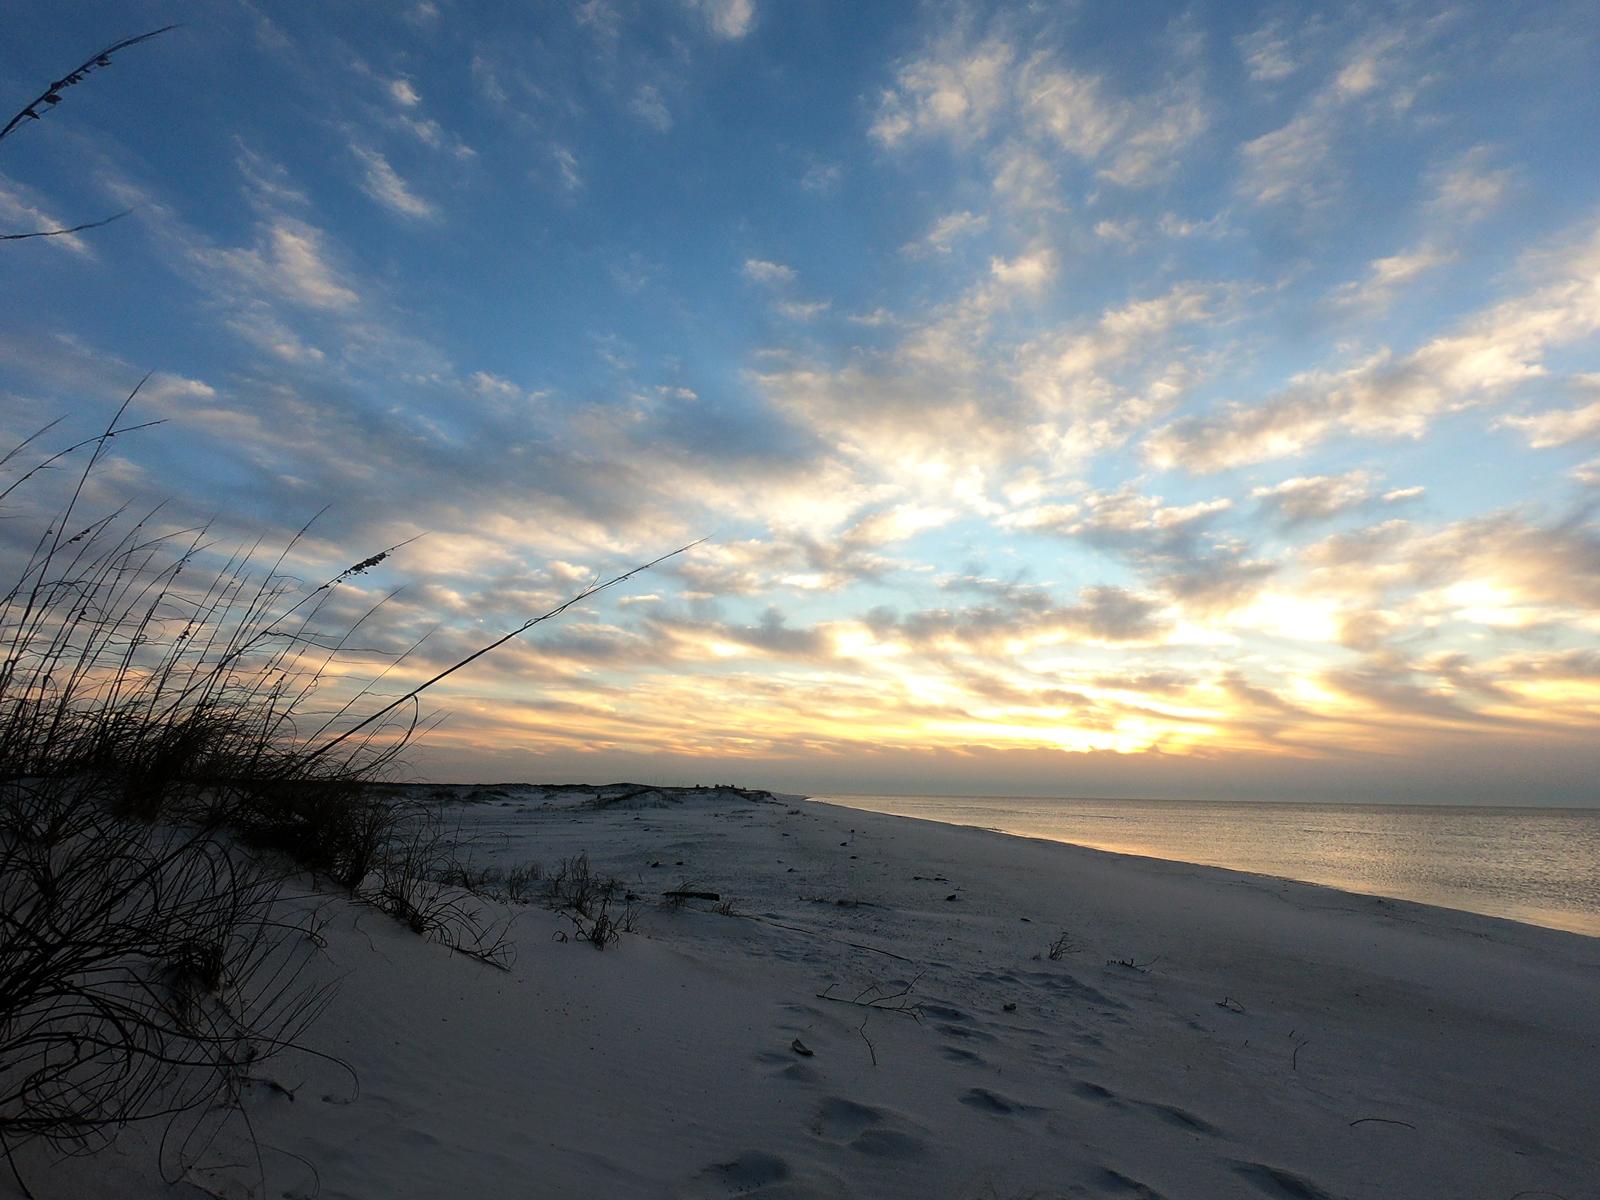 Sunrise at Gulf Islands National Seashore beach camping in Pensacola, Florida at Fort Pickens